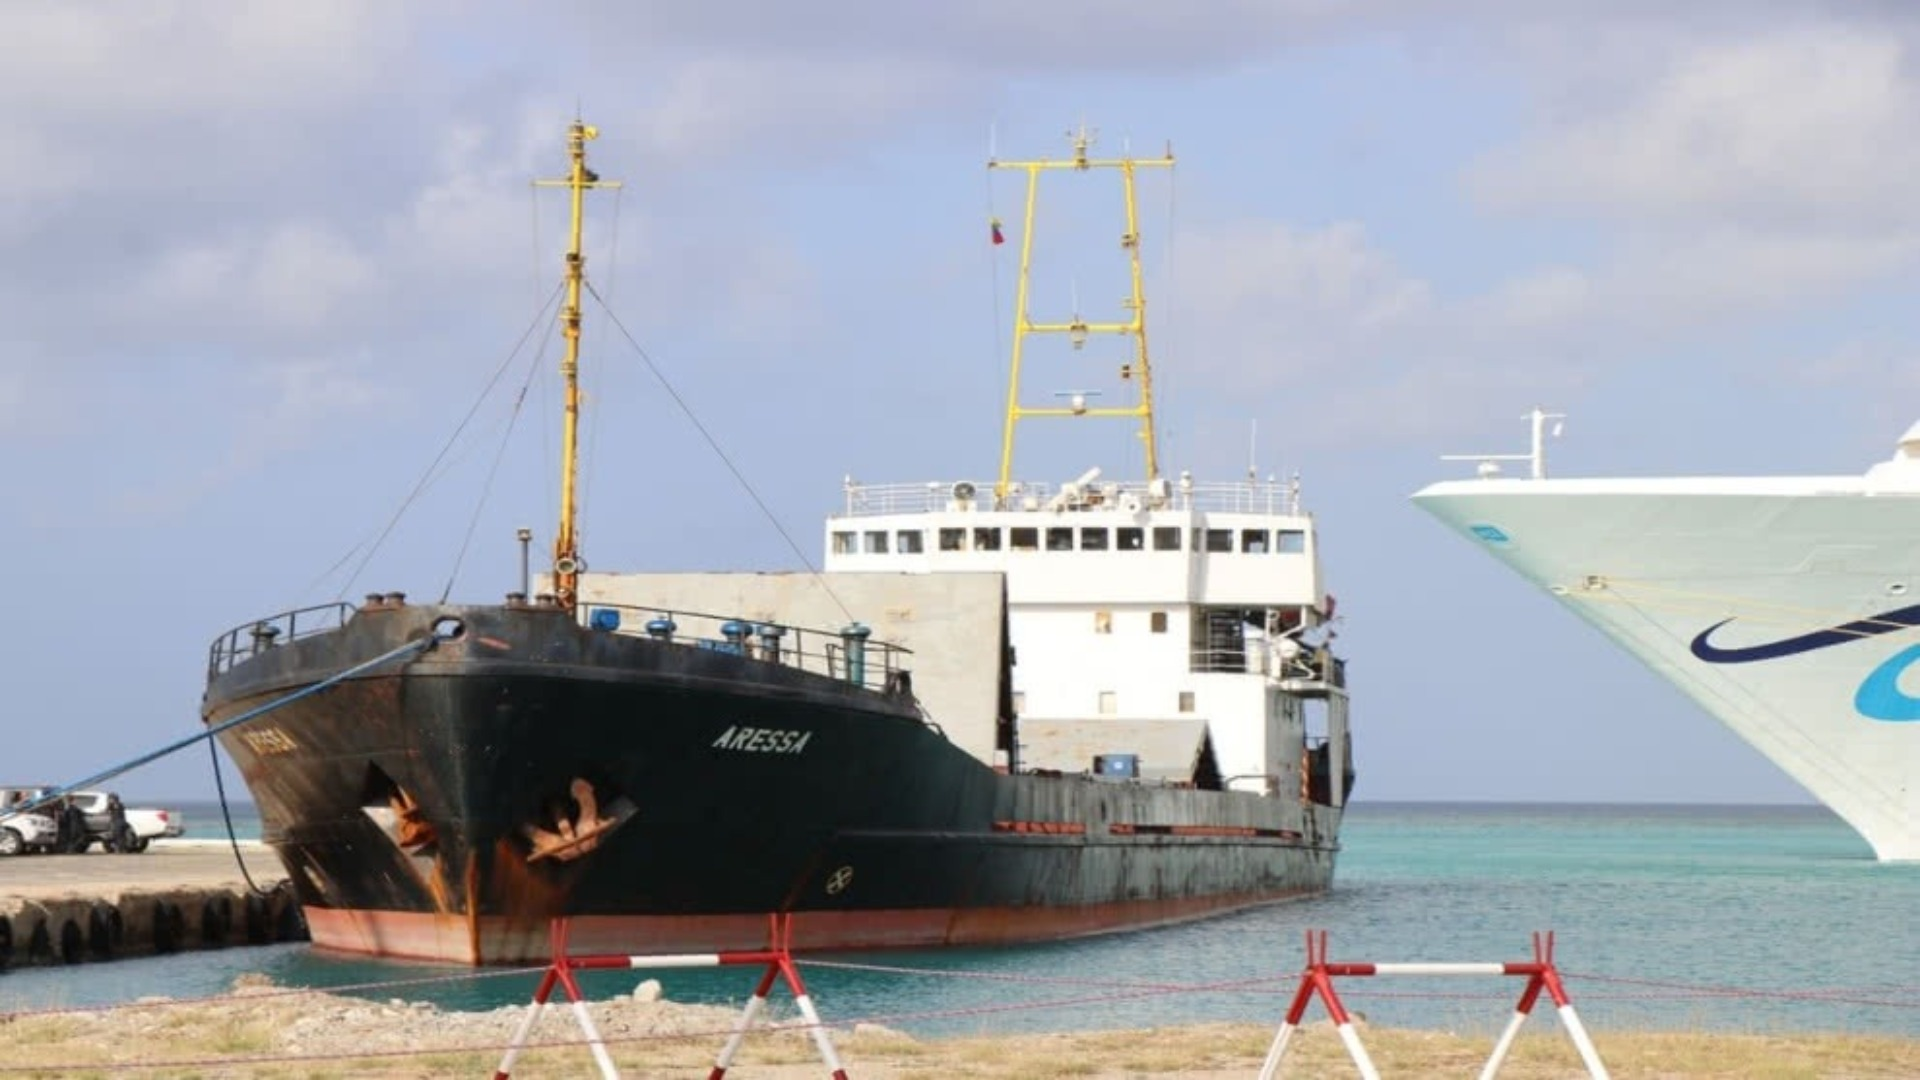 Asciende a 5 toneladas de cocaína incautada en barco que salió de Paraguaná